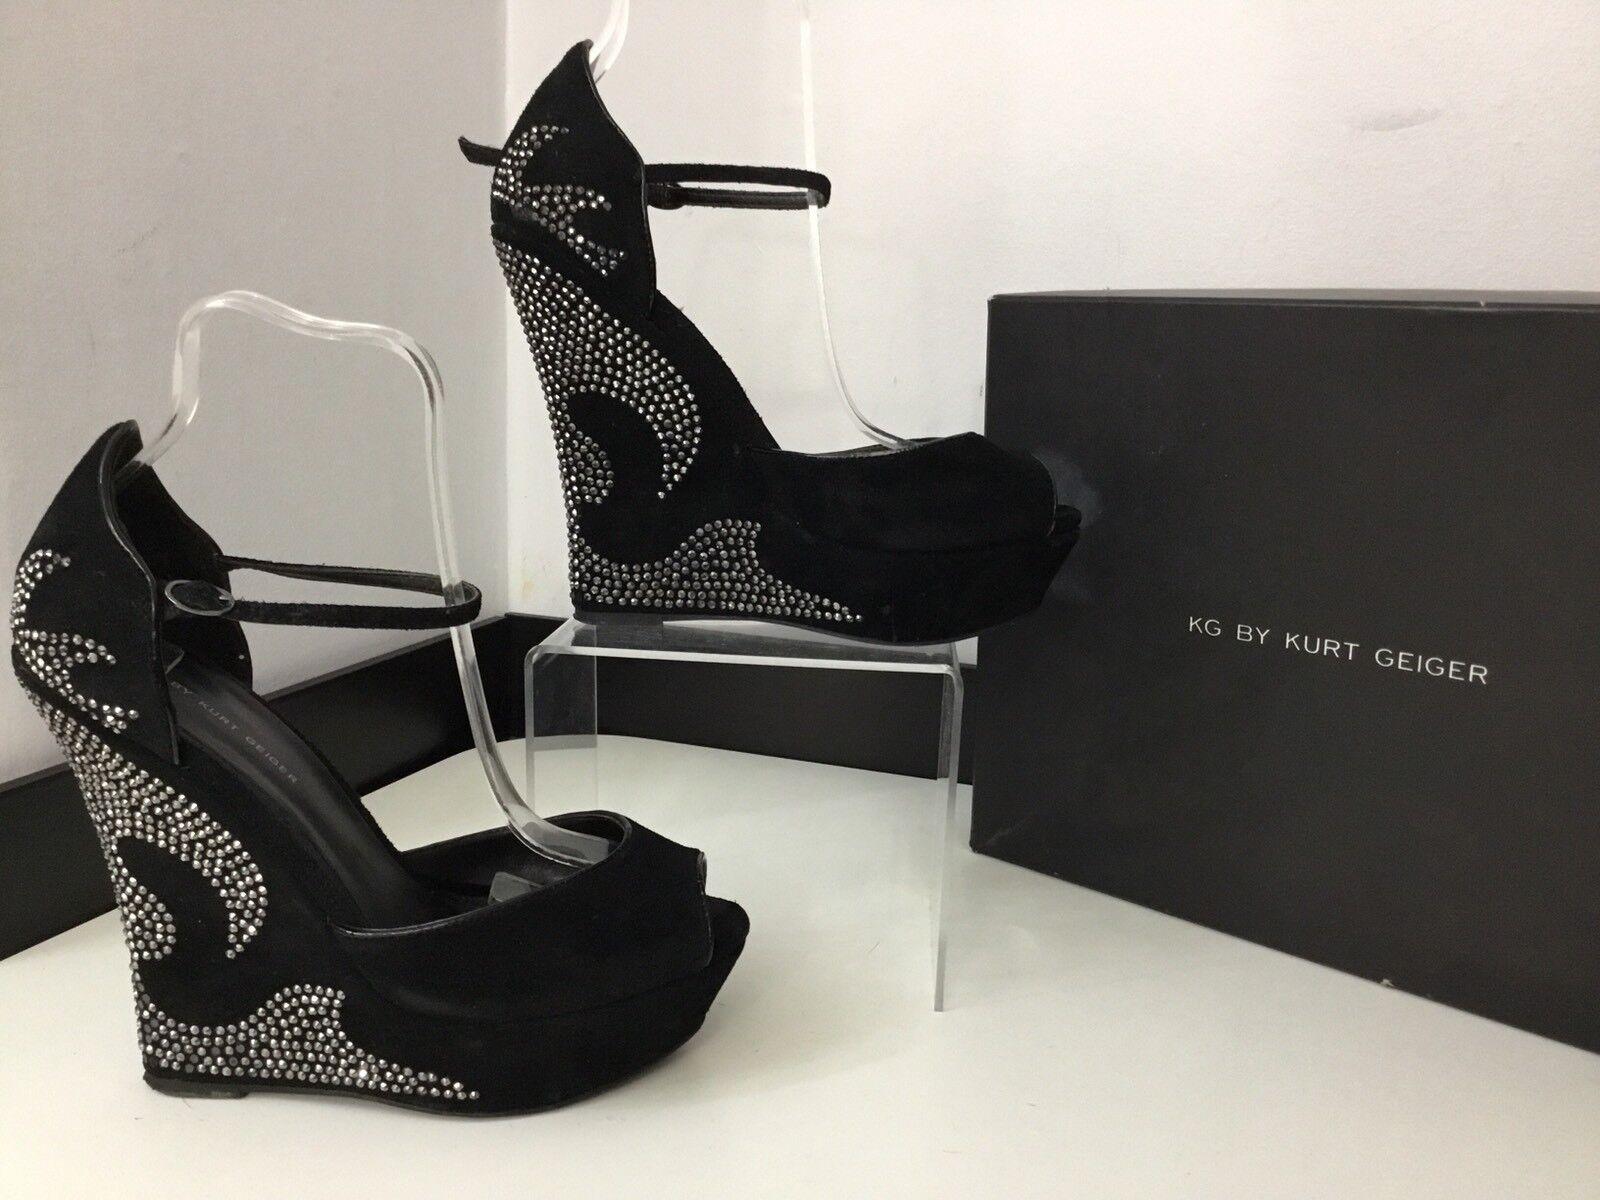 Kurt Geiger kg Isobel en daim noir en cuir compensées chaussures Taille 39 UK 6